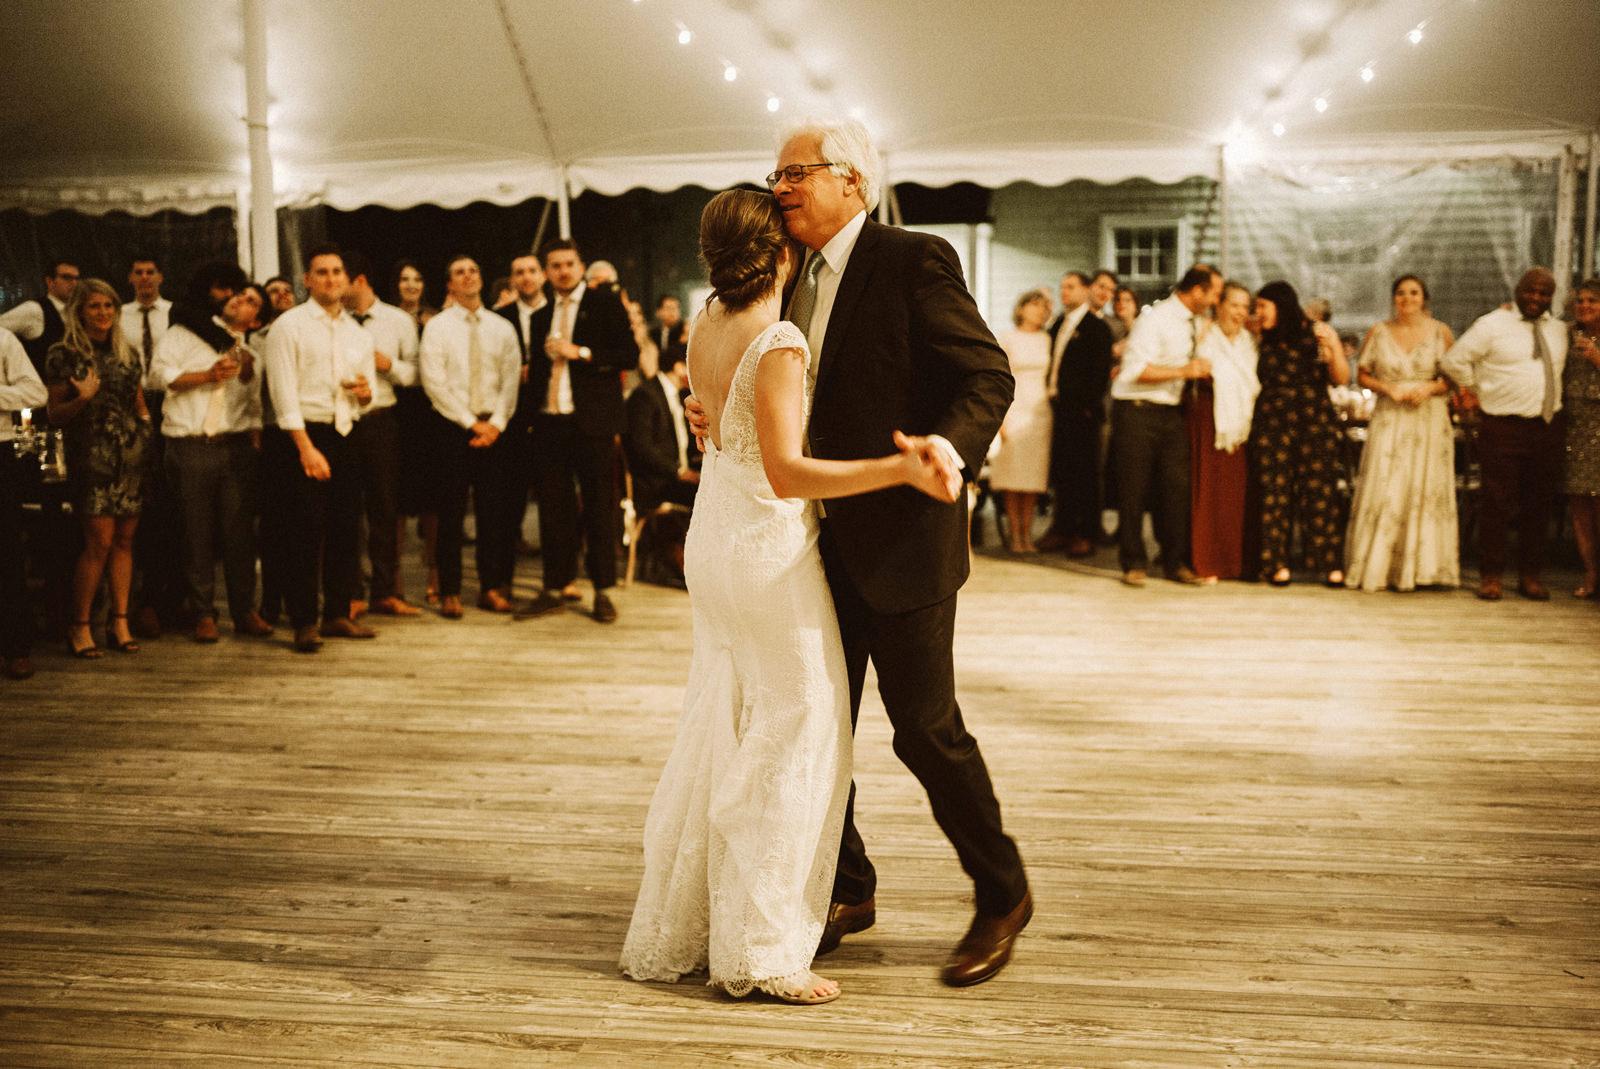 bridgeport-wedding-160 BRIDGEPORT, CONNECTICUT BACKYARD WEDDING